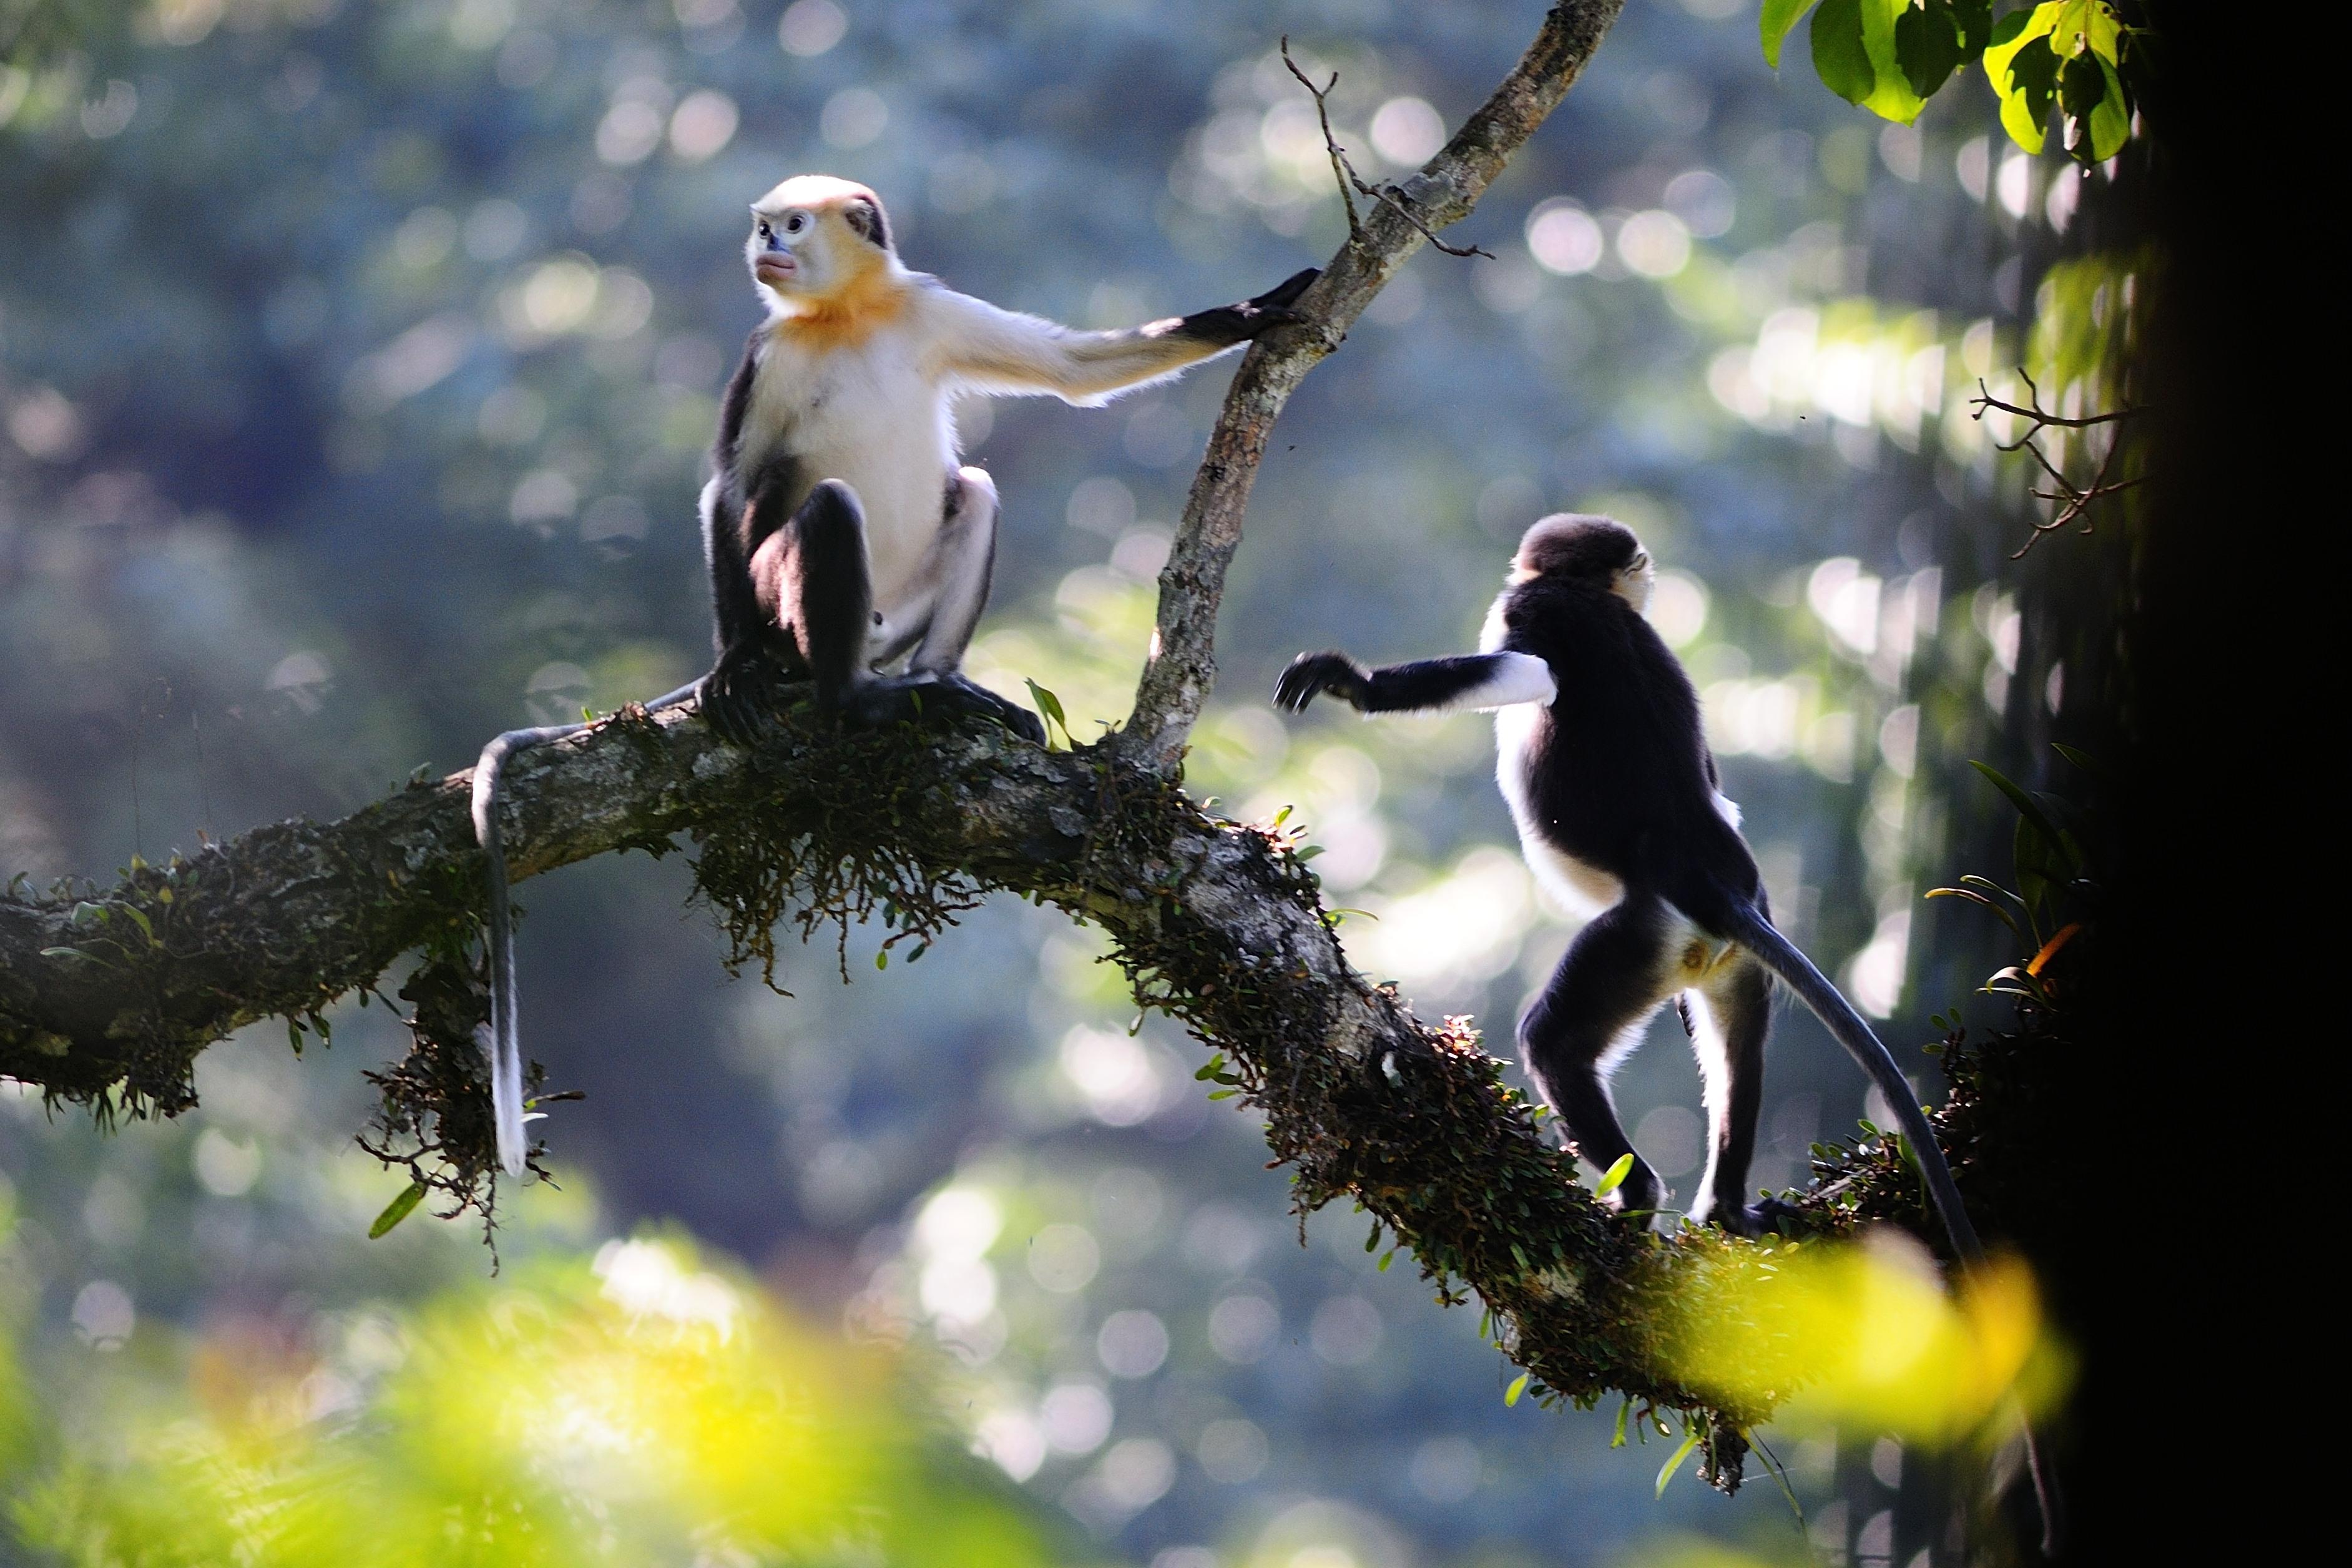 High Resolution Wallpaper | Golden Snub-nosed Monkey 3768x2512 px